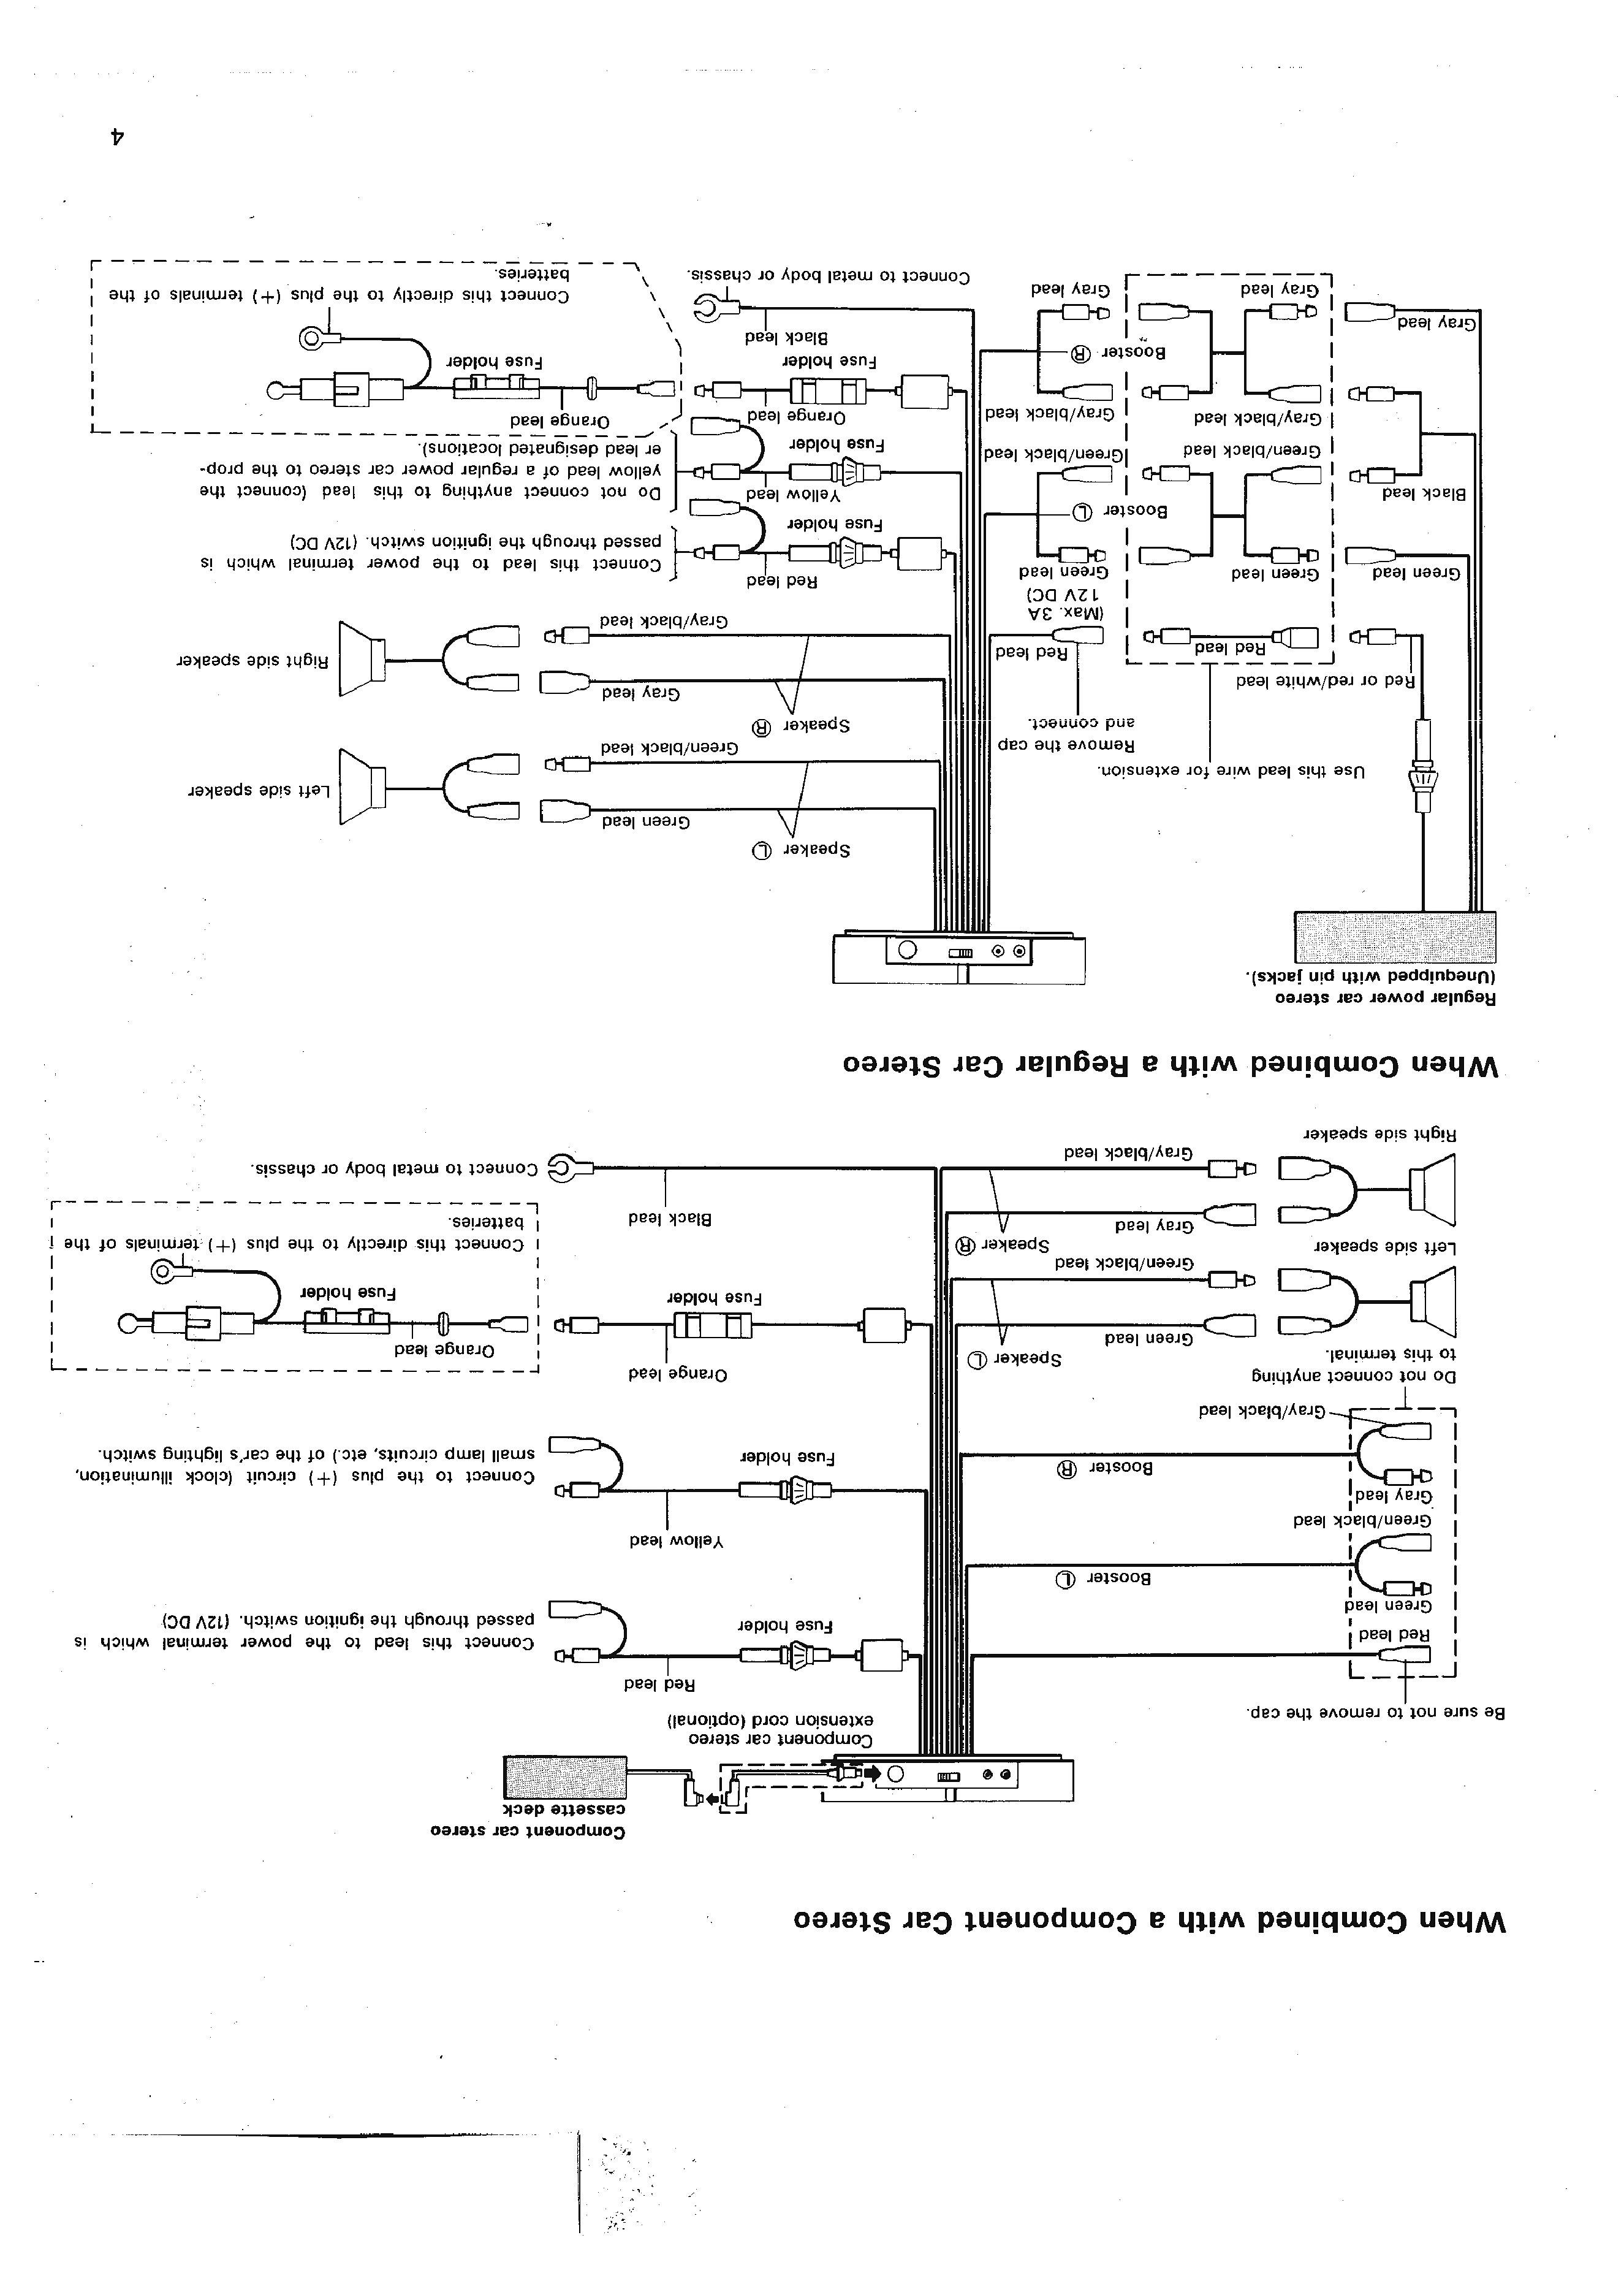 wiring mp diagram radio deh p2900 - vwxyz.astonmartin.apotheke-fritz.de  diagram source